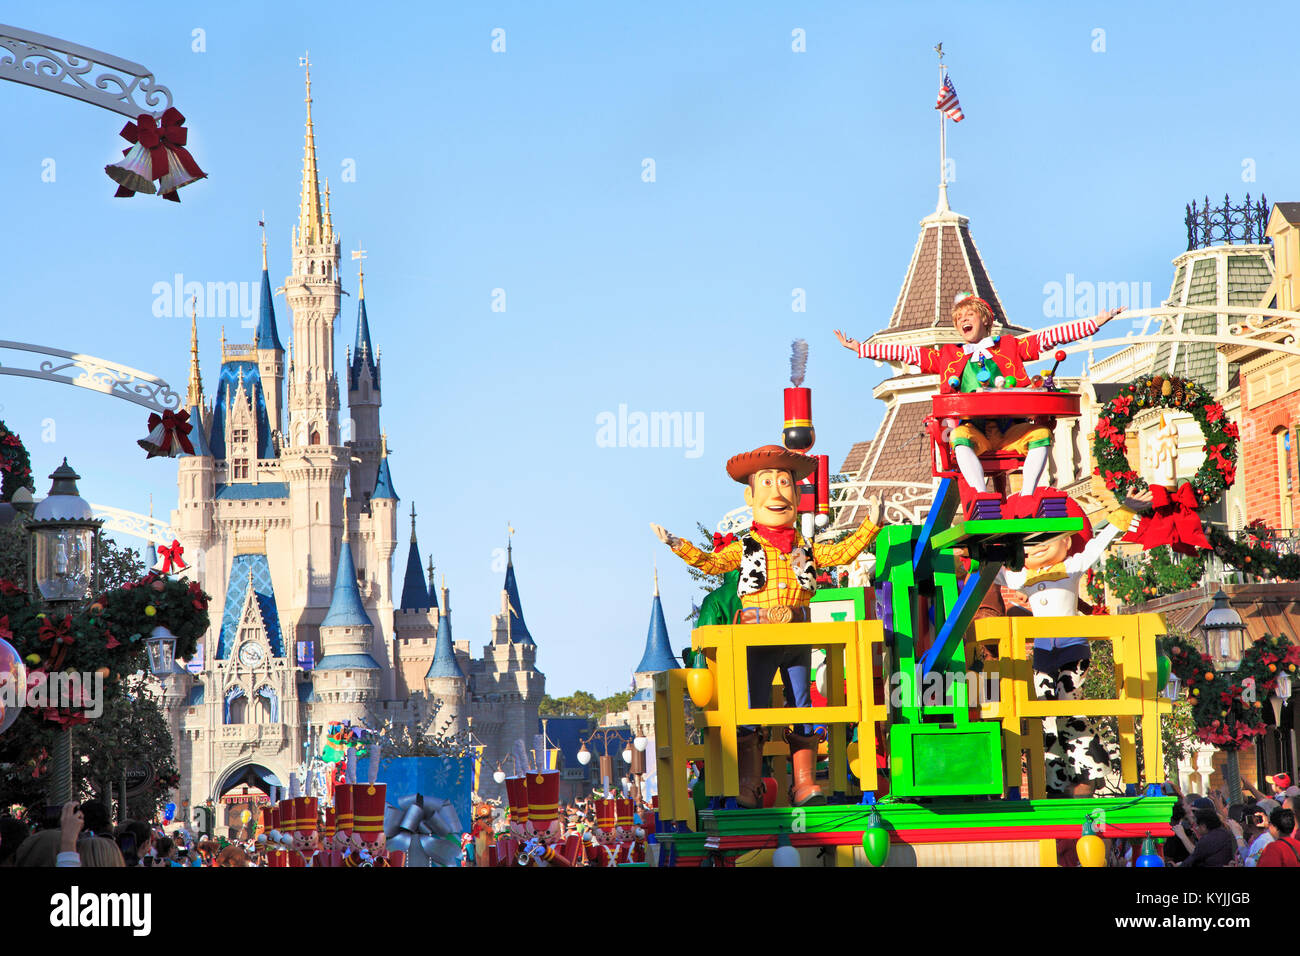 Christmas Parade in Magic Kingdom, Orlando, Florida - Stock Image